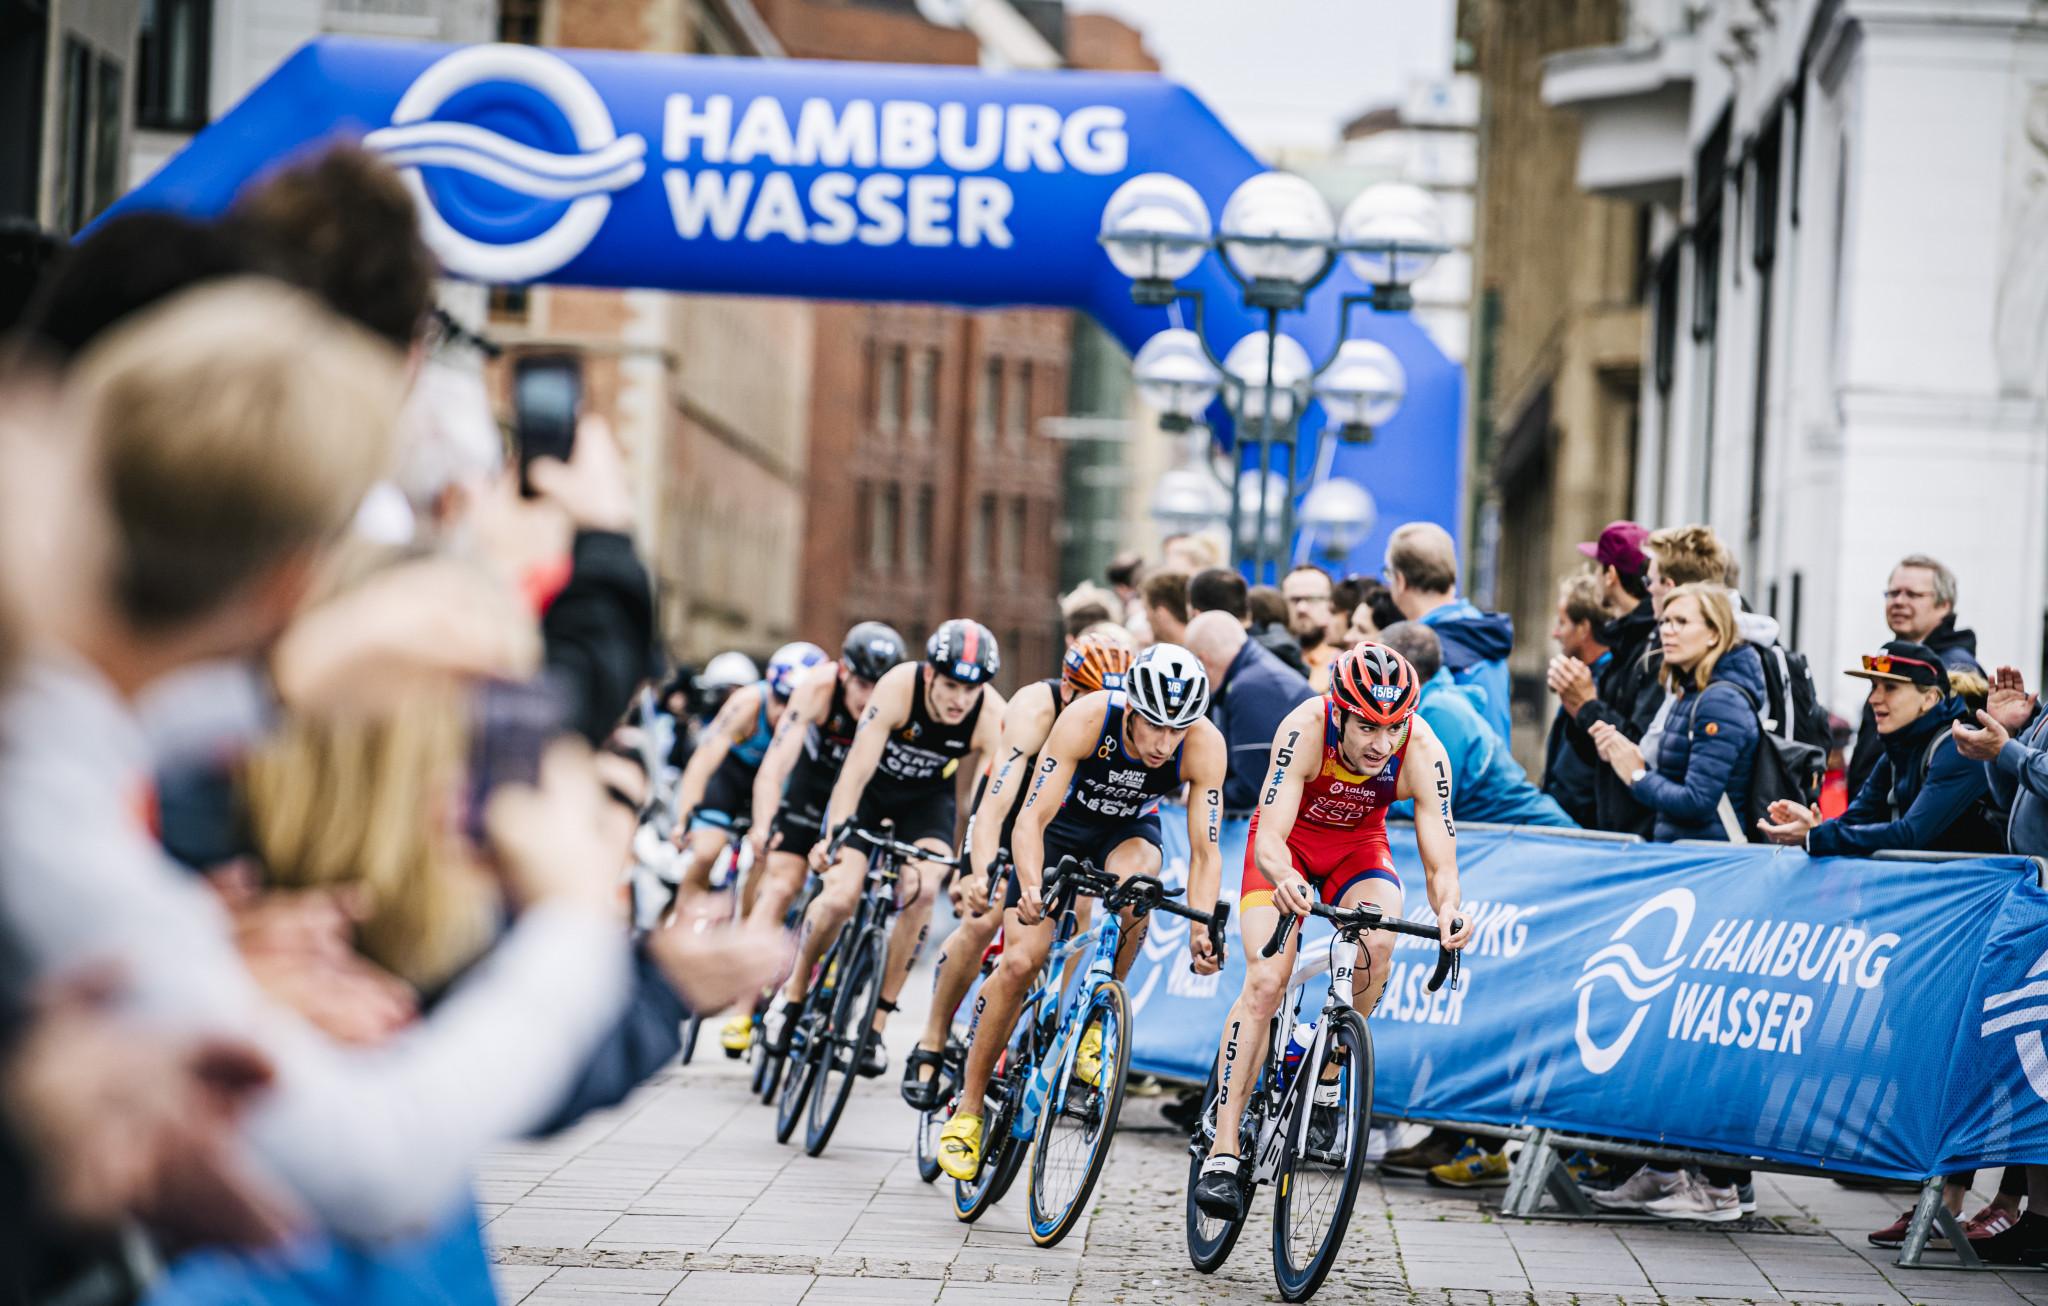 Postponed Hamburg World Triathlon Championship Series event will now start 2021-2022 season